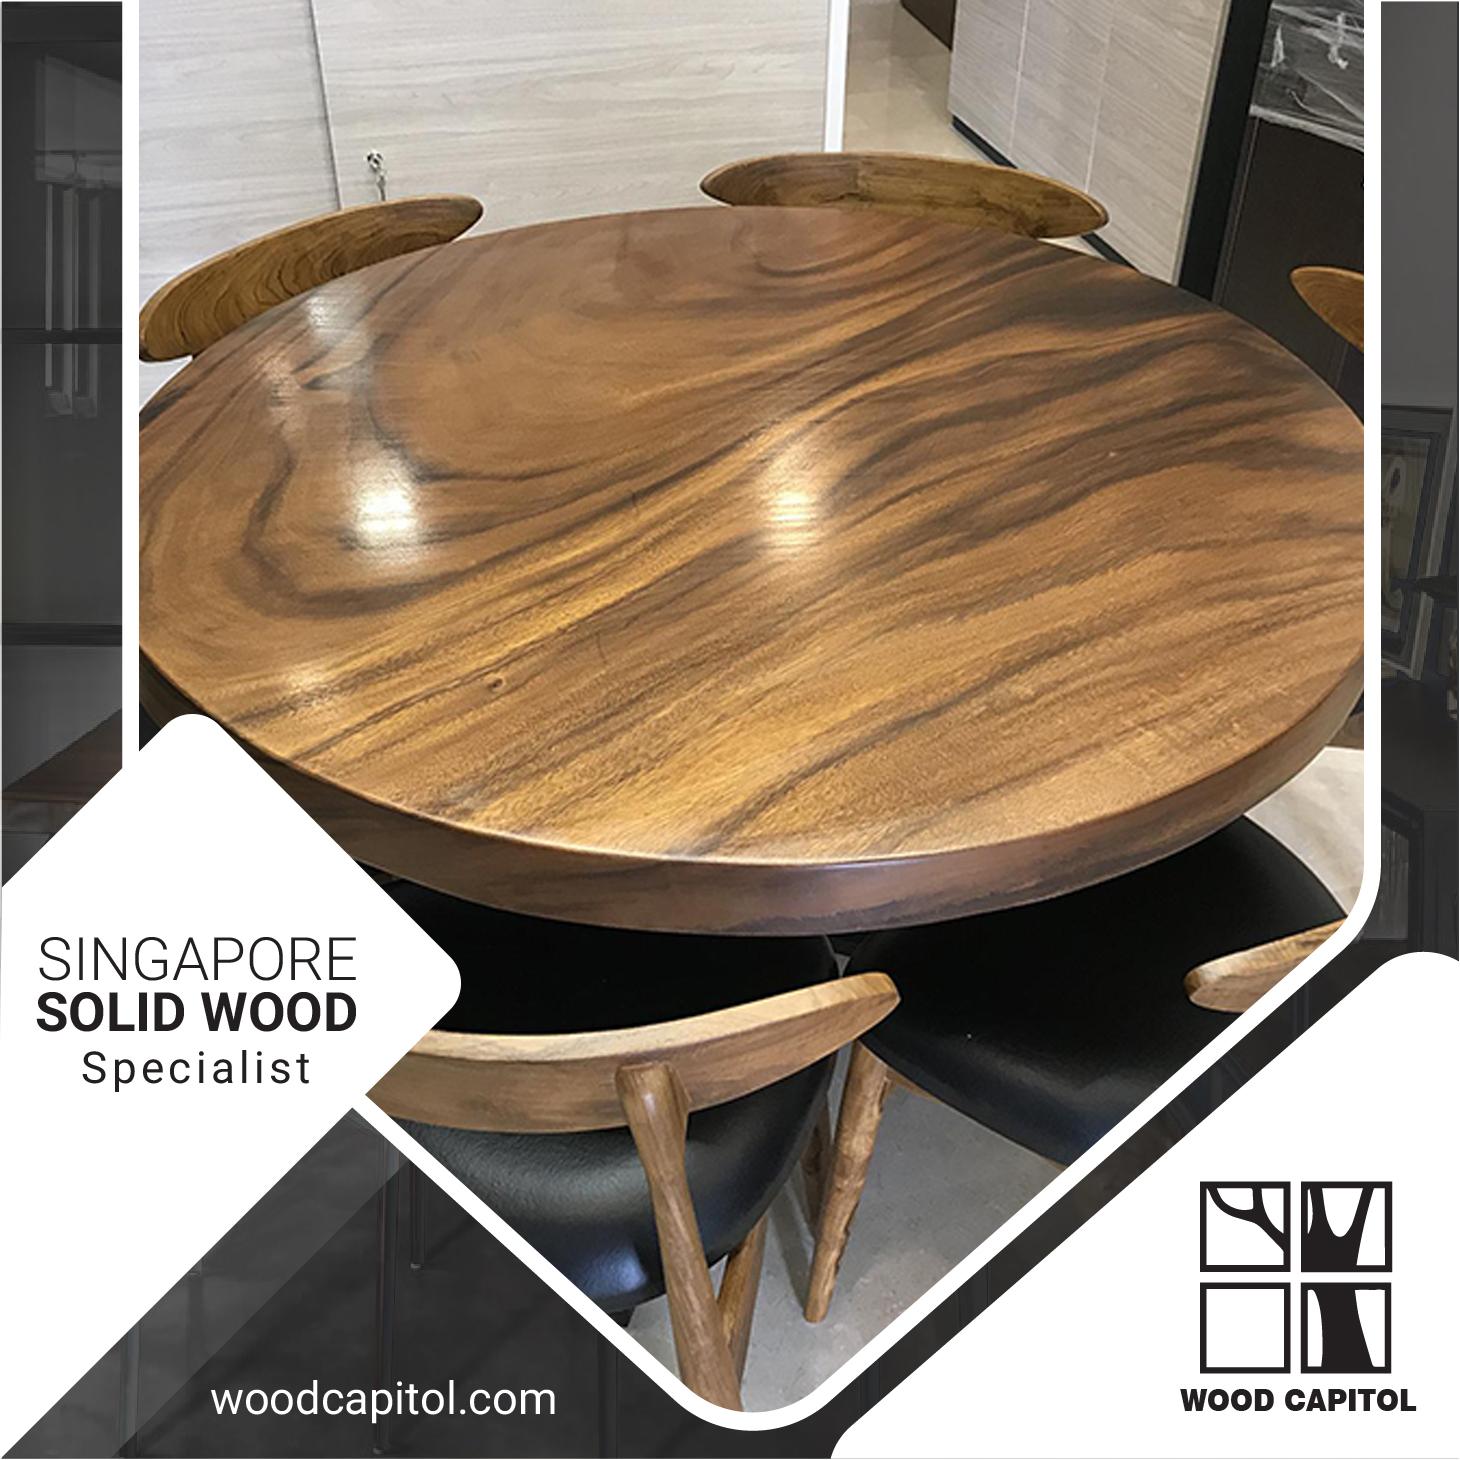 Wood Capitol Suar Wood Round Dining Table Lazada Singapore